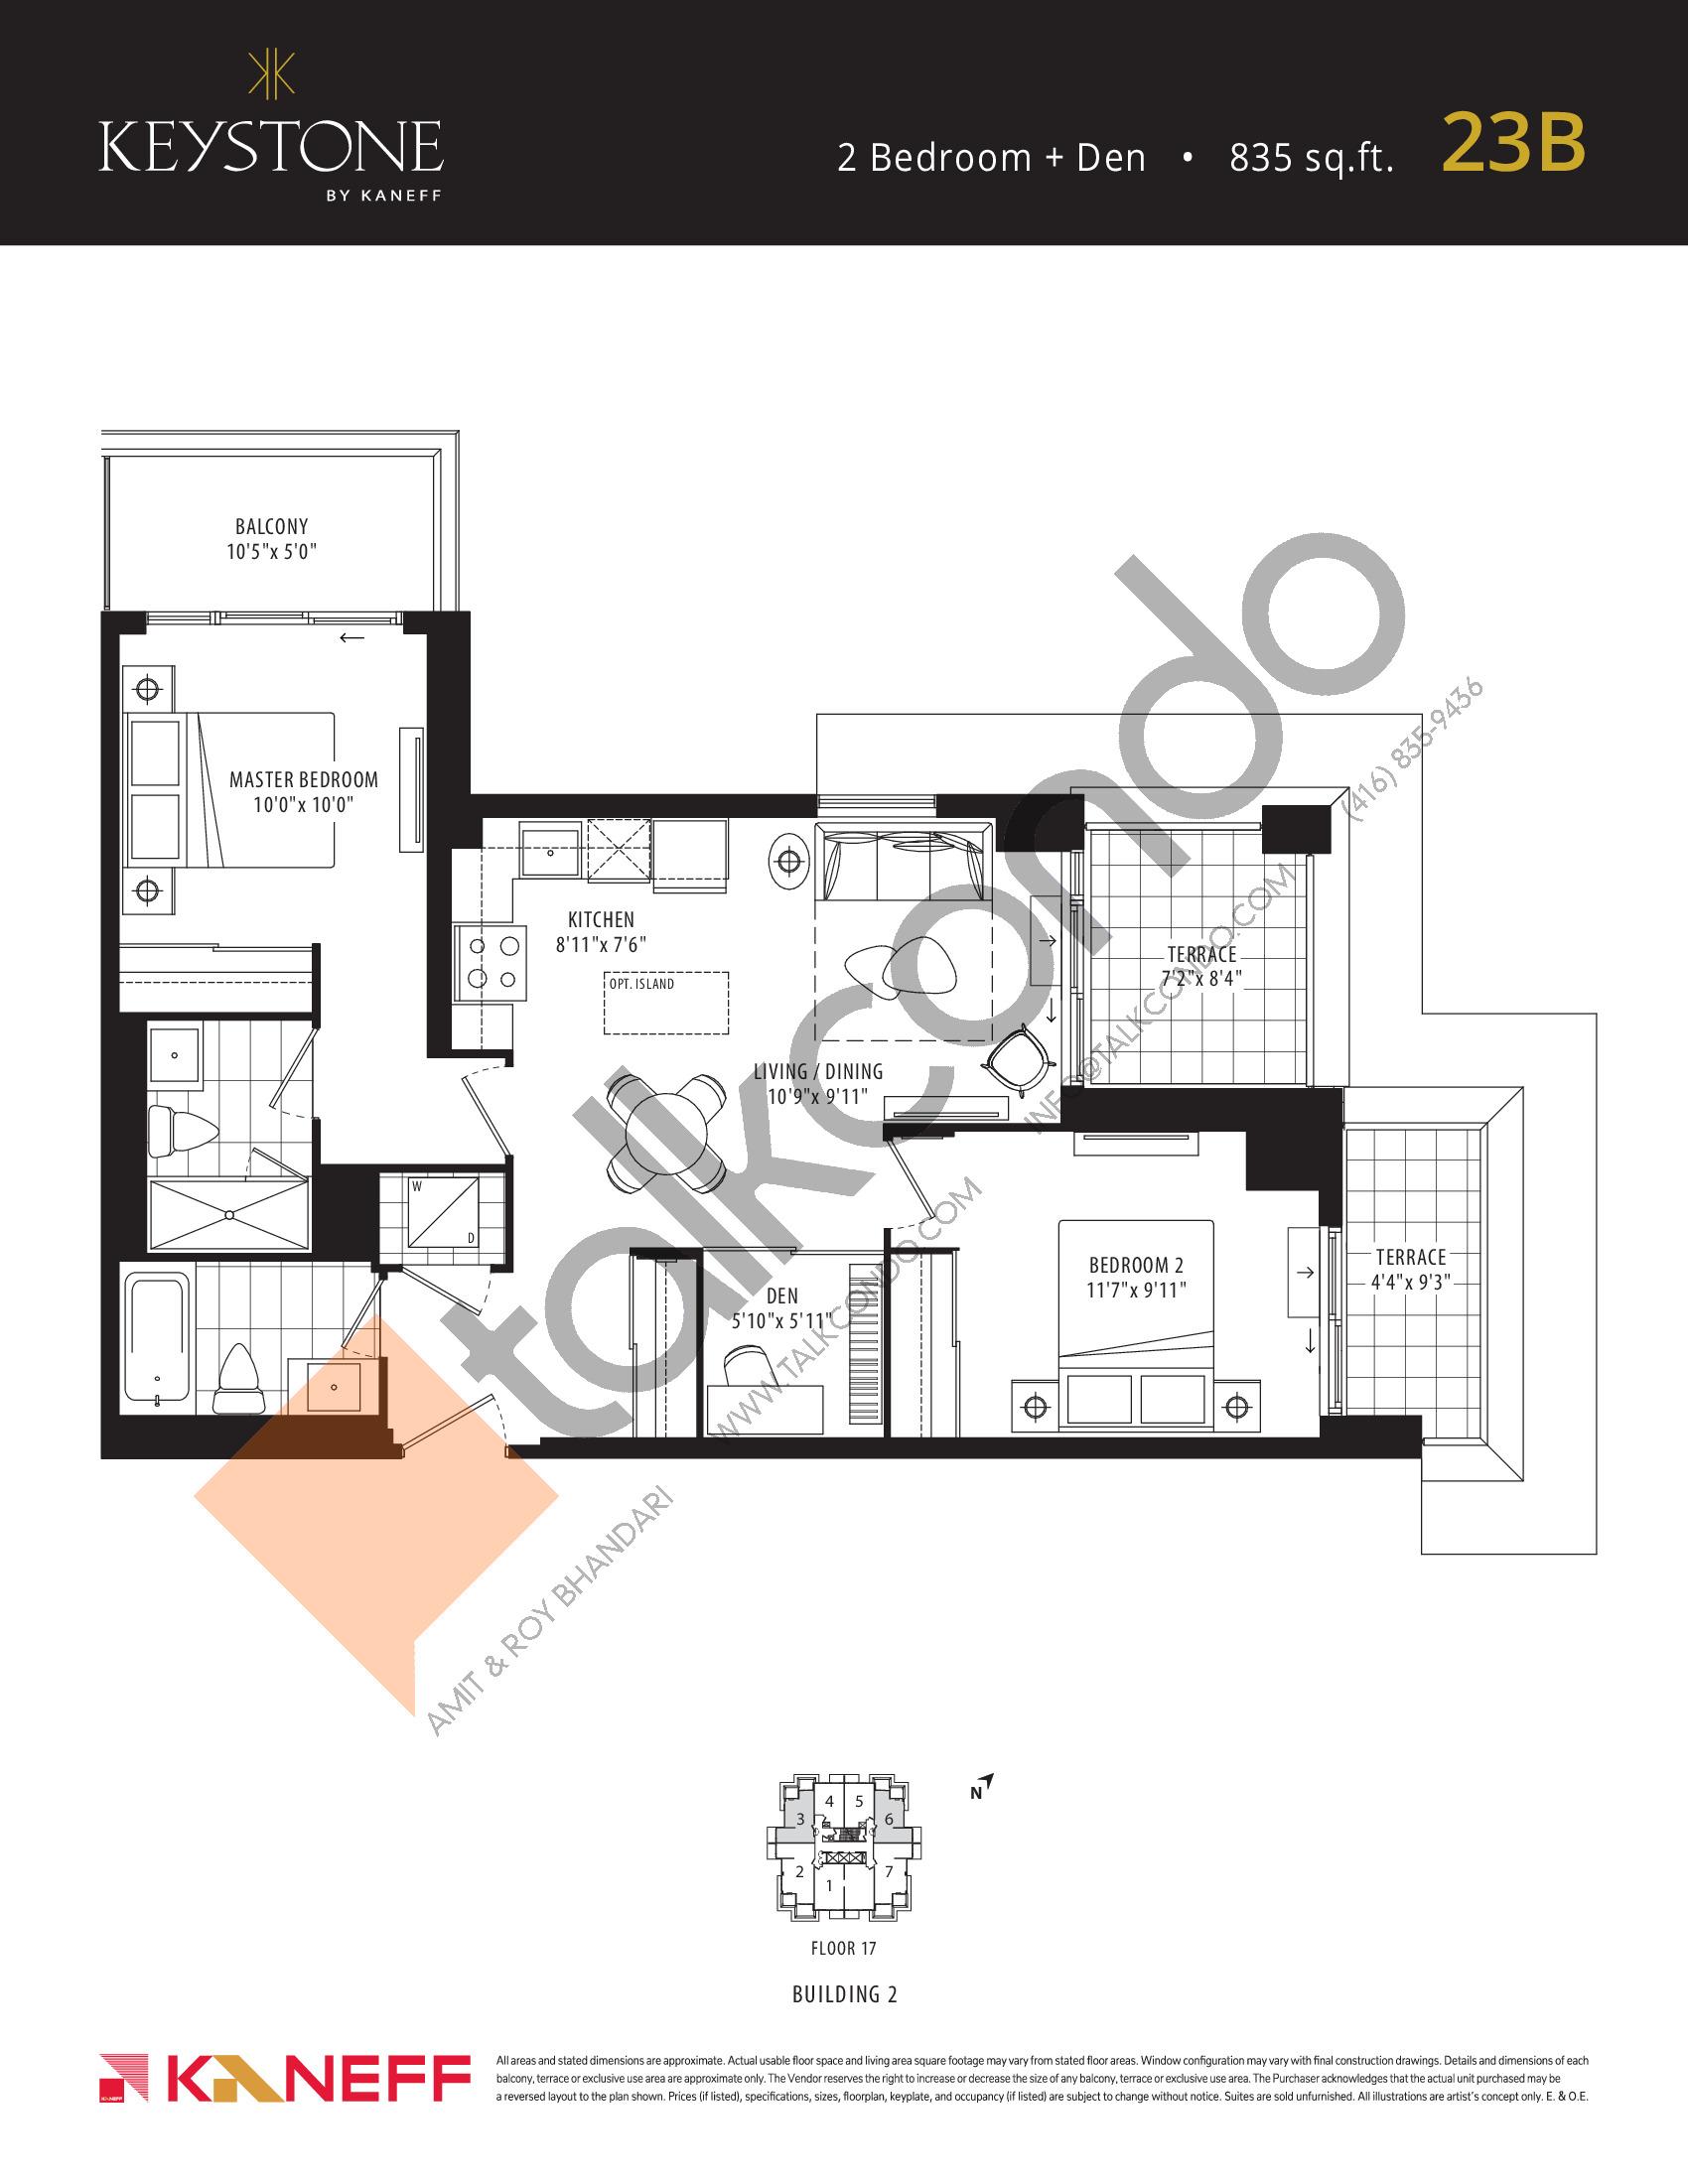 23B Floor Plan at Keystone Condos Phase 2 - 835 sq.ft